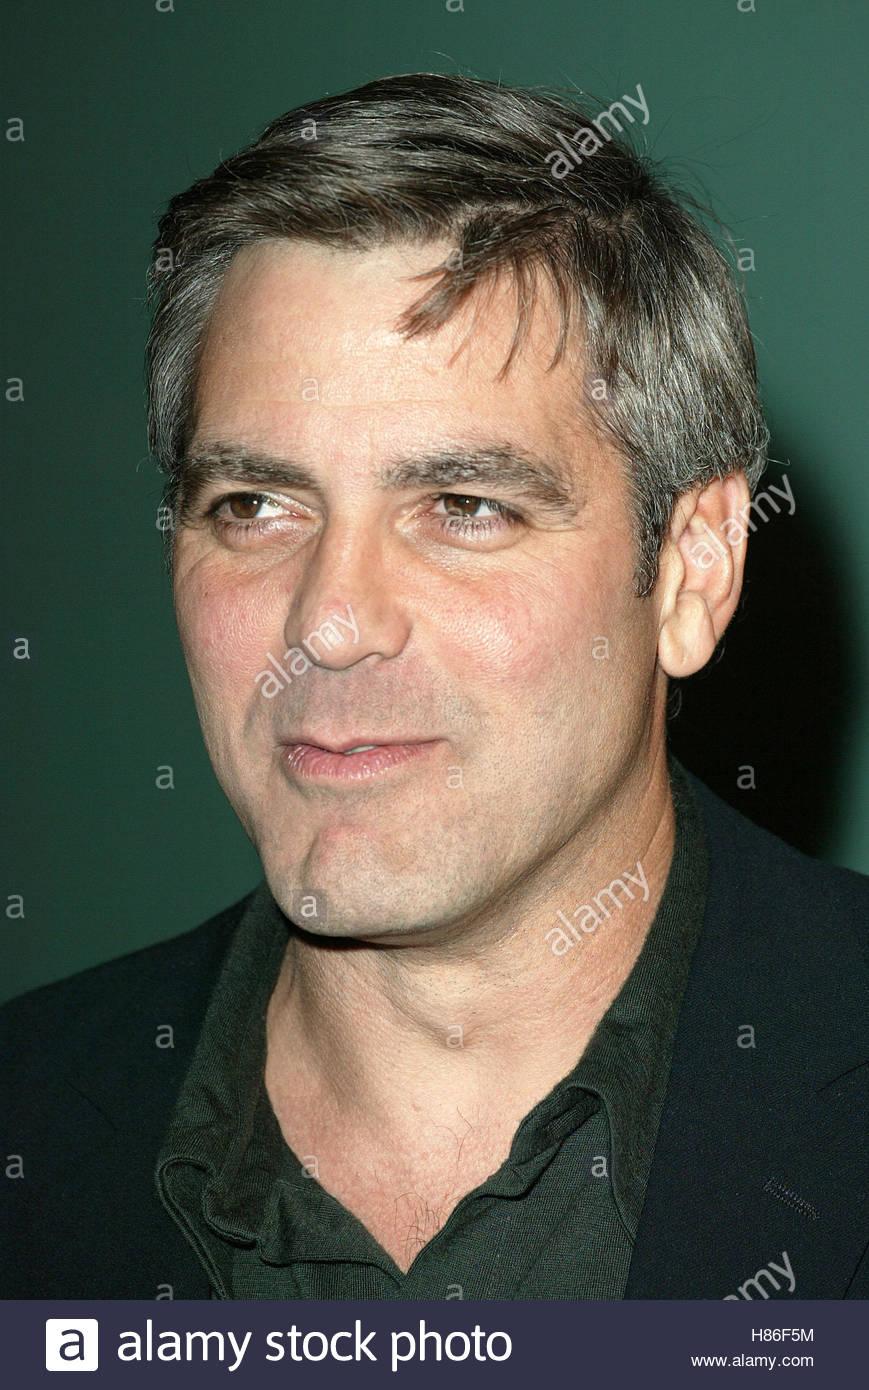 Solaris George Clooney Stock Photos Solaris George Clooney Stock 869x1390